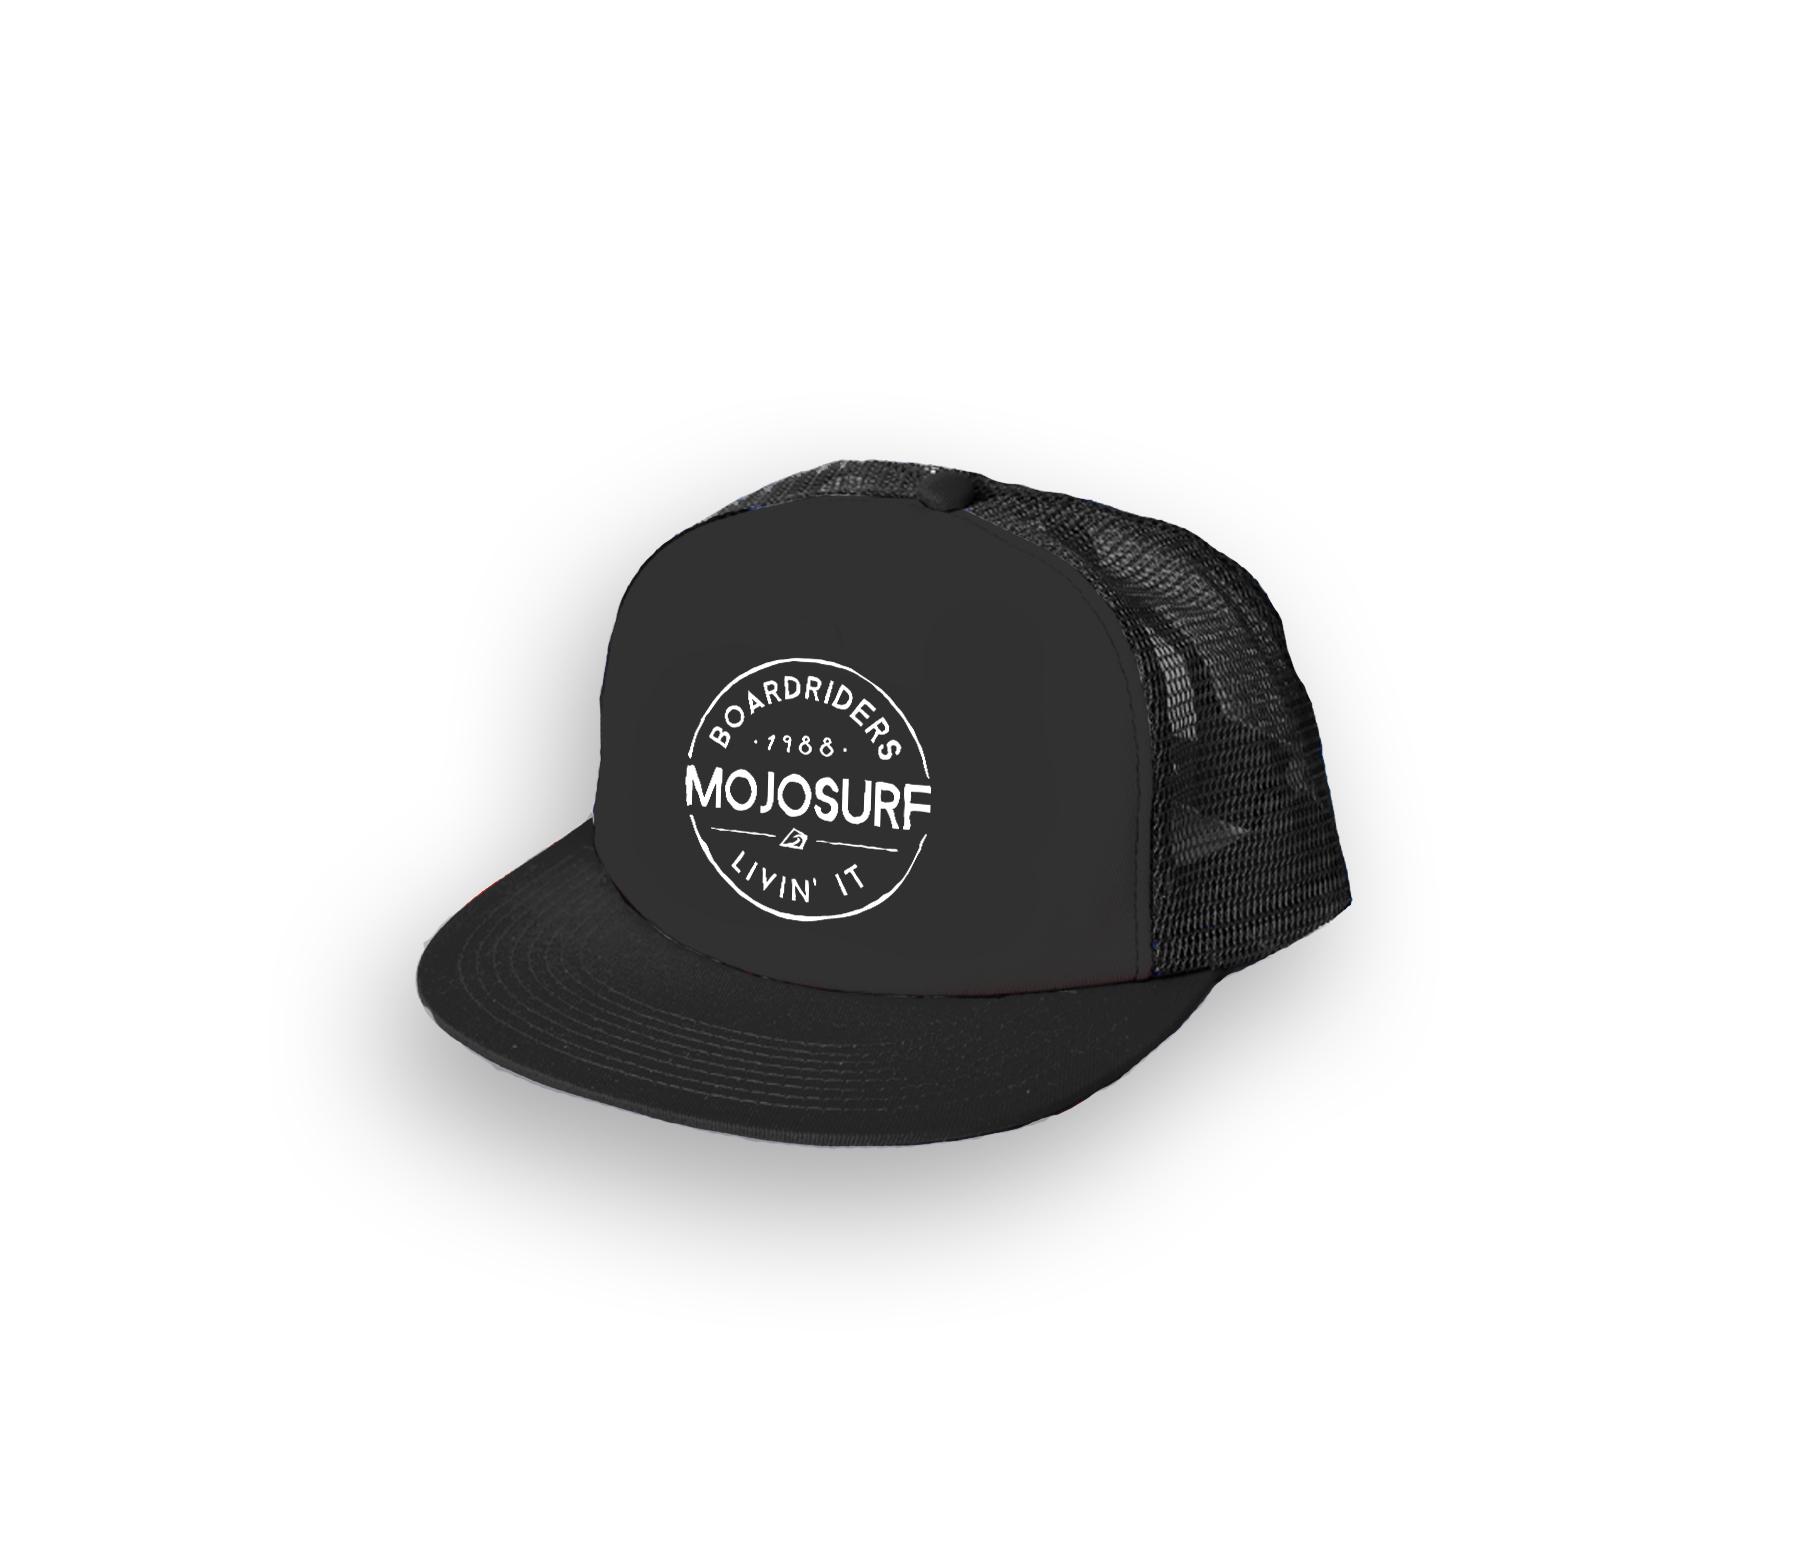 Mojosurf_snapback_flatpeak trucker_black patch (2)